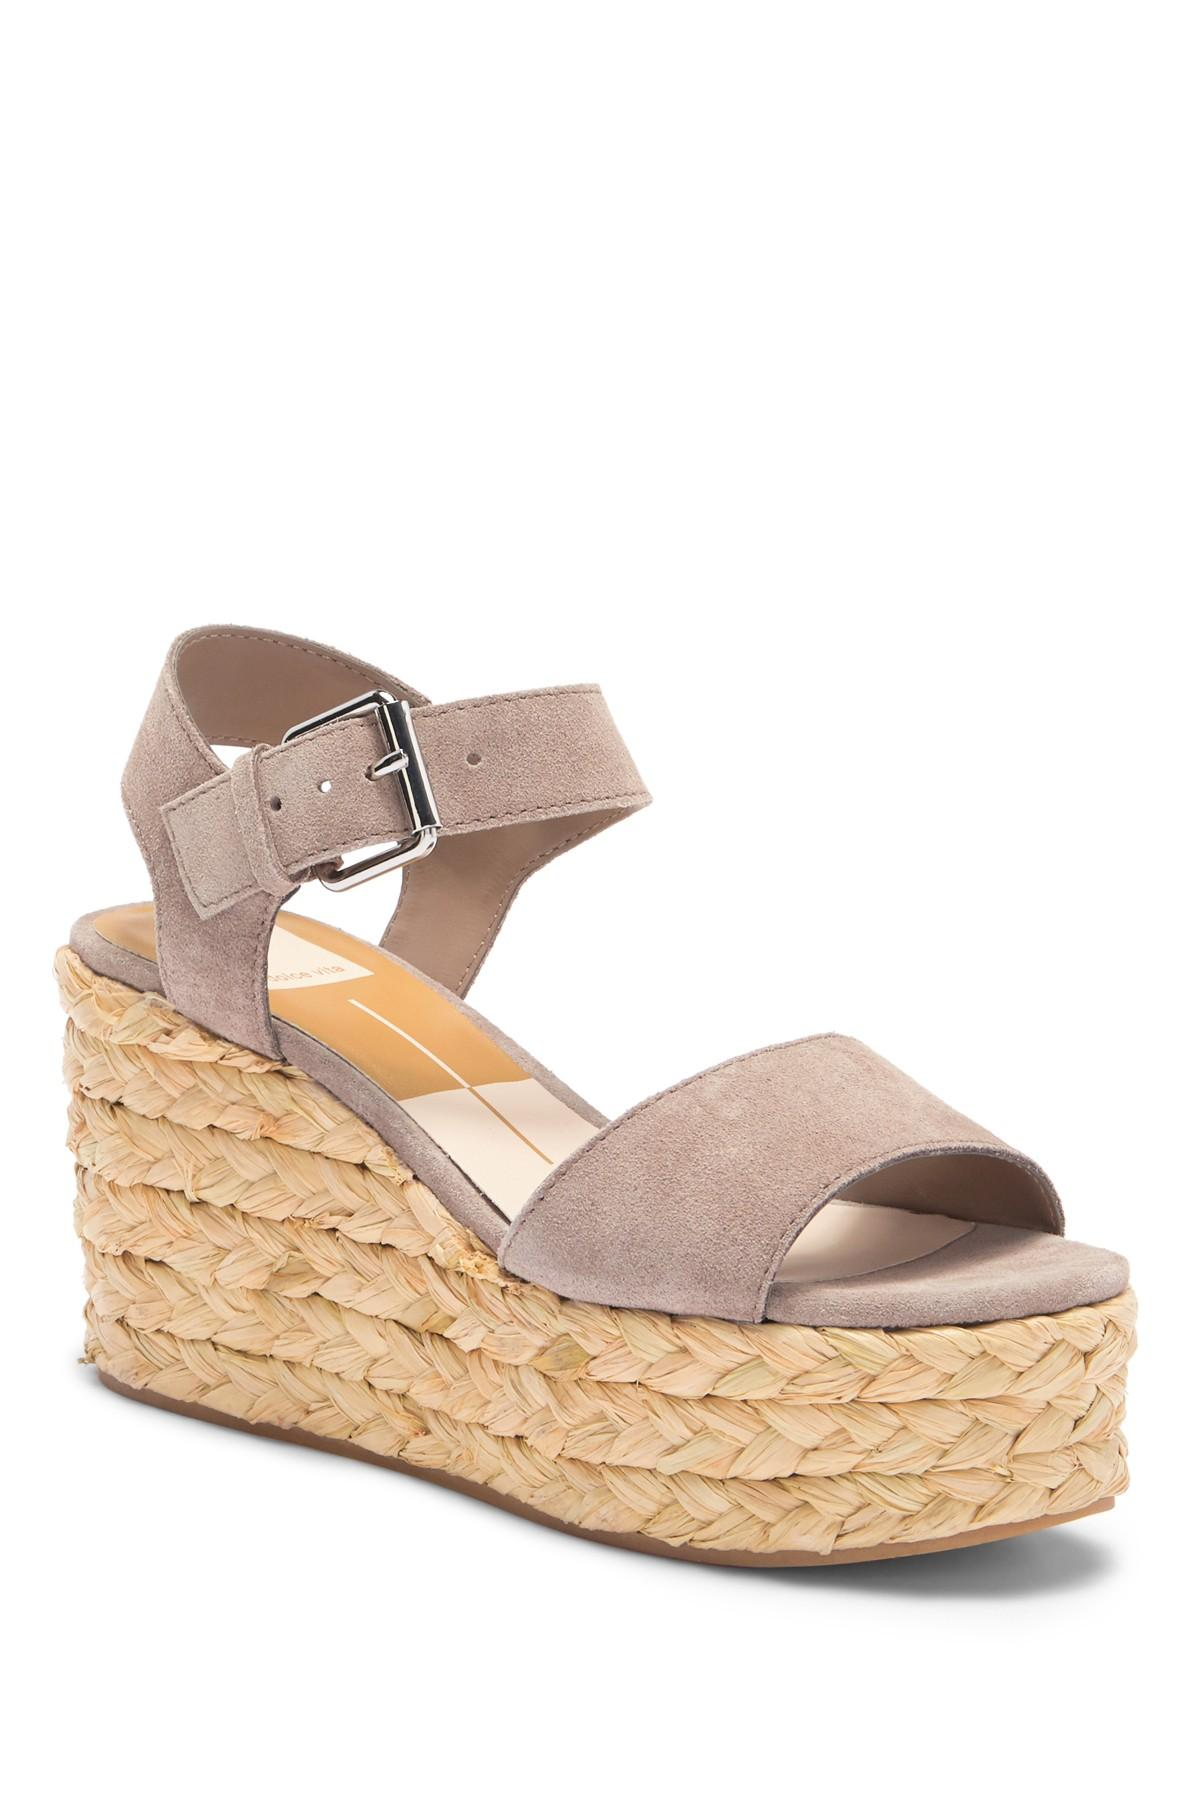 8874fc2ad08 Lyst - Dolce Vita Sacha Espadrille Platform Wedge Sandal